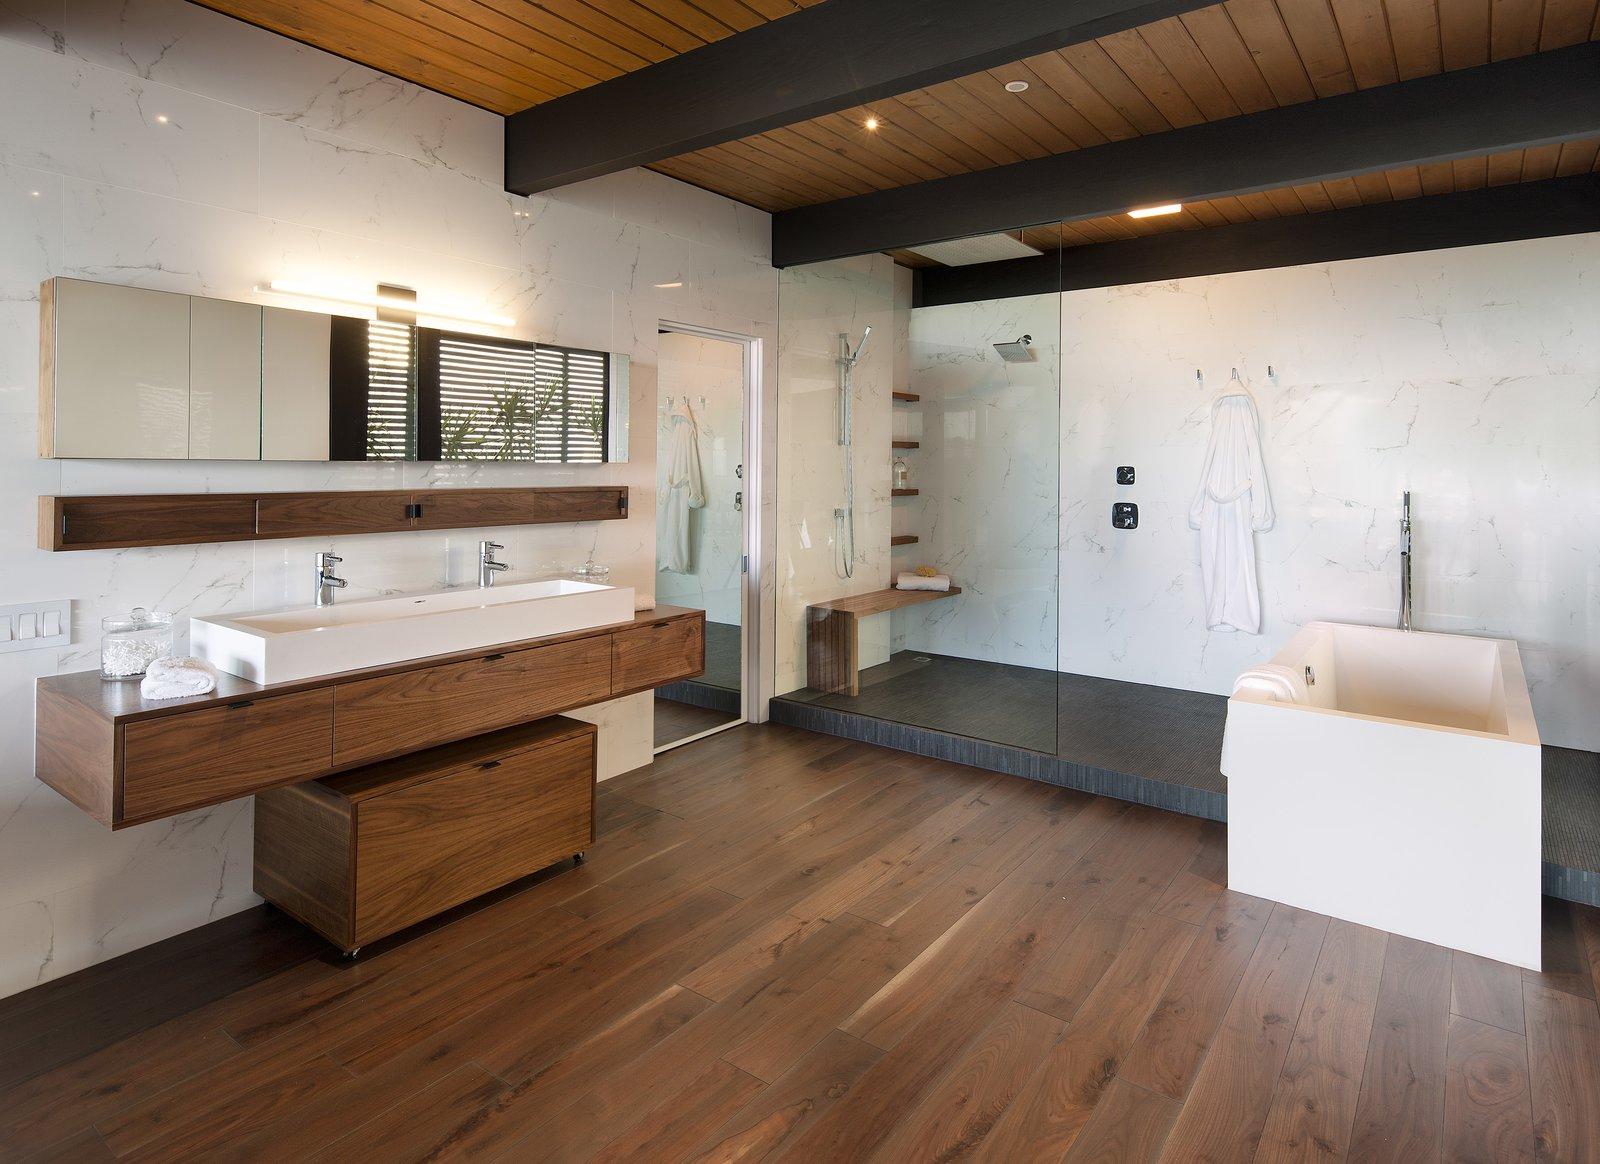 Bath Room, Vessel Sink, Wood Counter, Medium Hardwood Floor, Freestanding Tub, Open Shower, Corner Shower, Recessed Lighting, and Marble Wall  Paseo Ferrelo